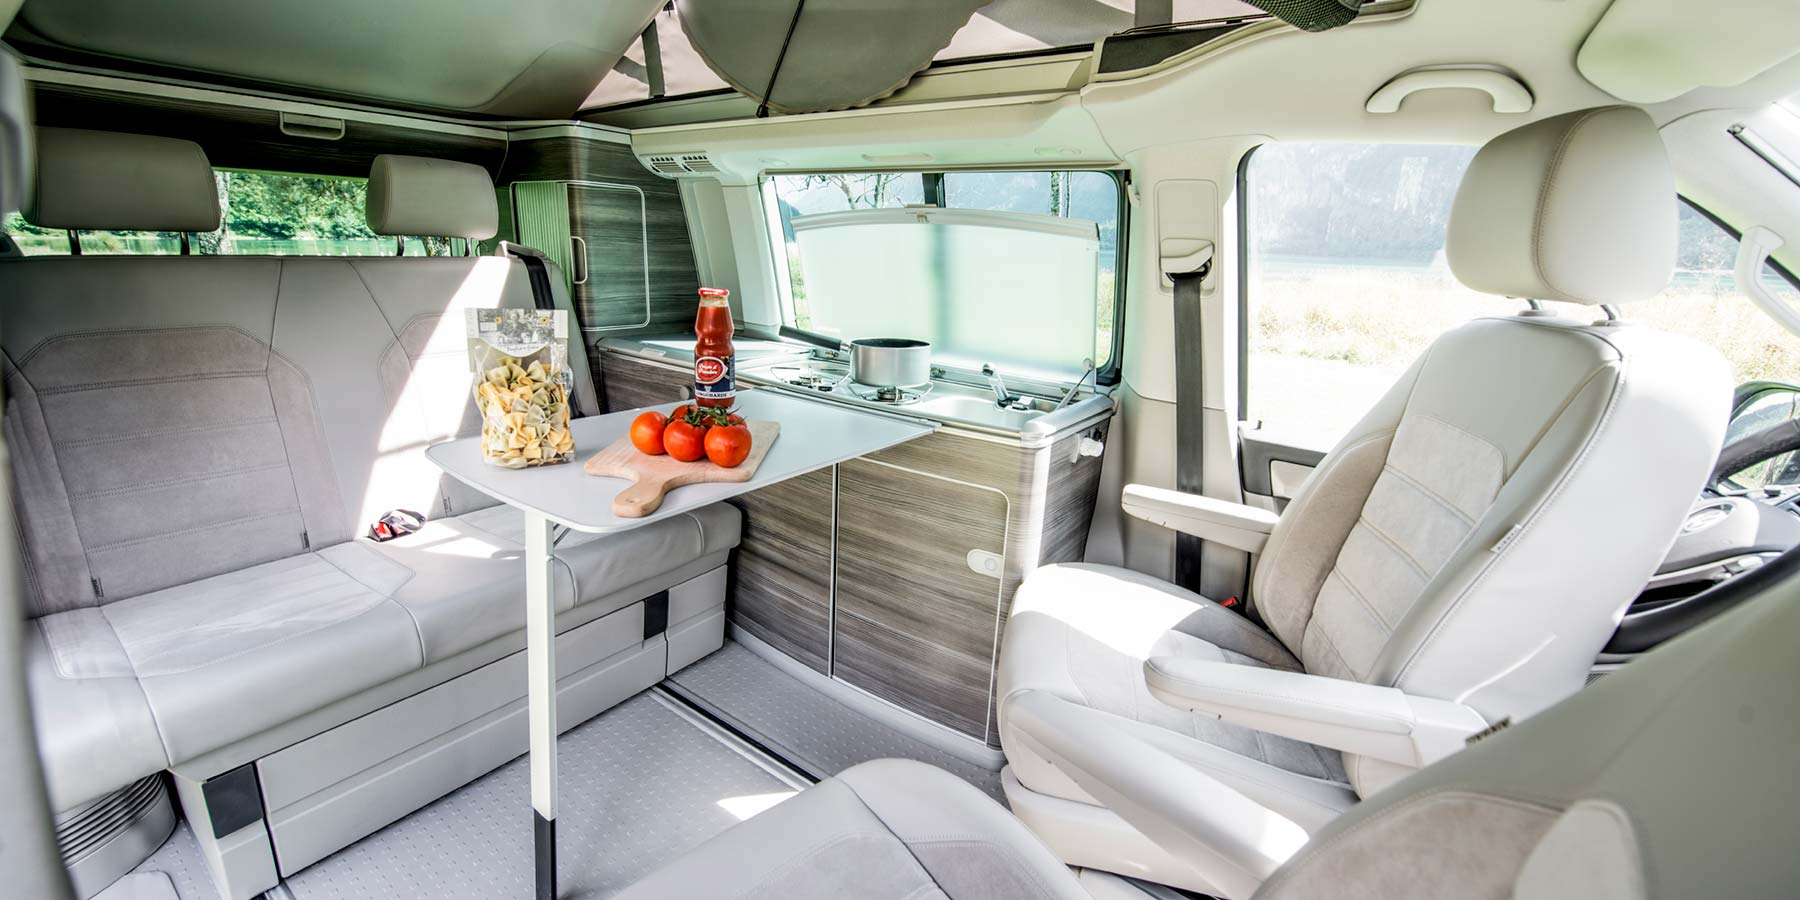 Camper mieten Schweiz, VW T6 California, Wohnraum, Interieur